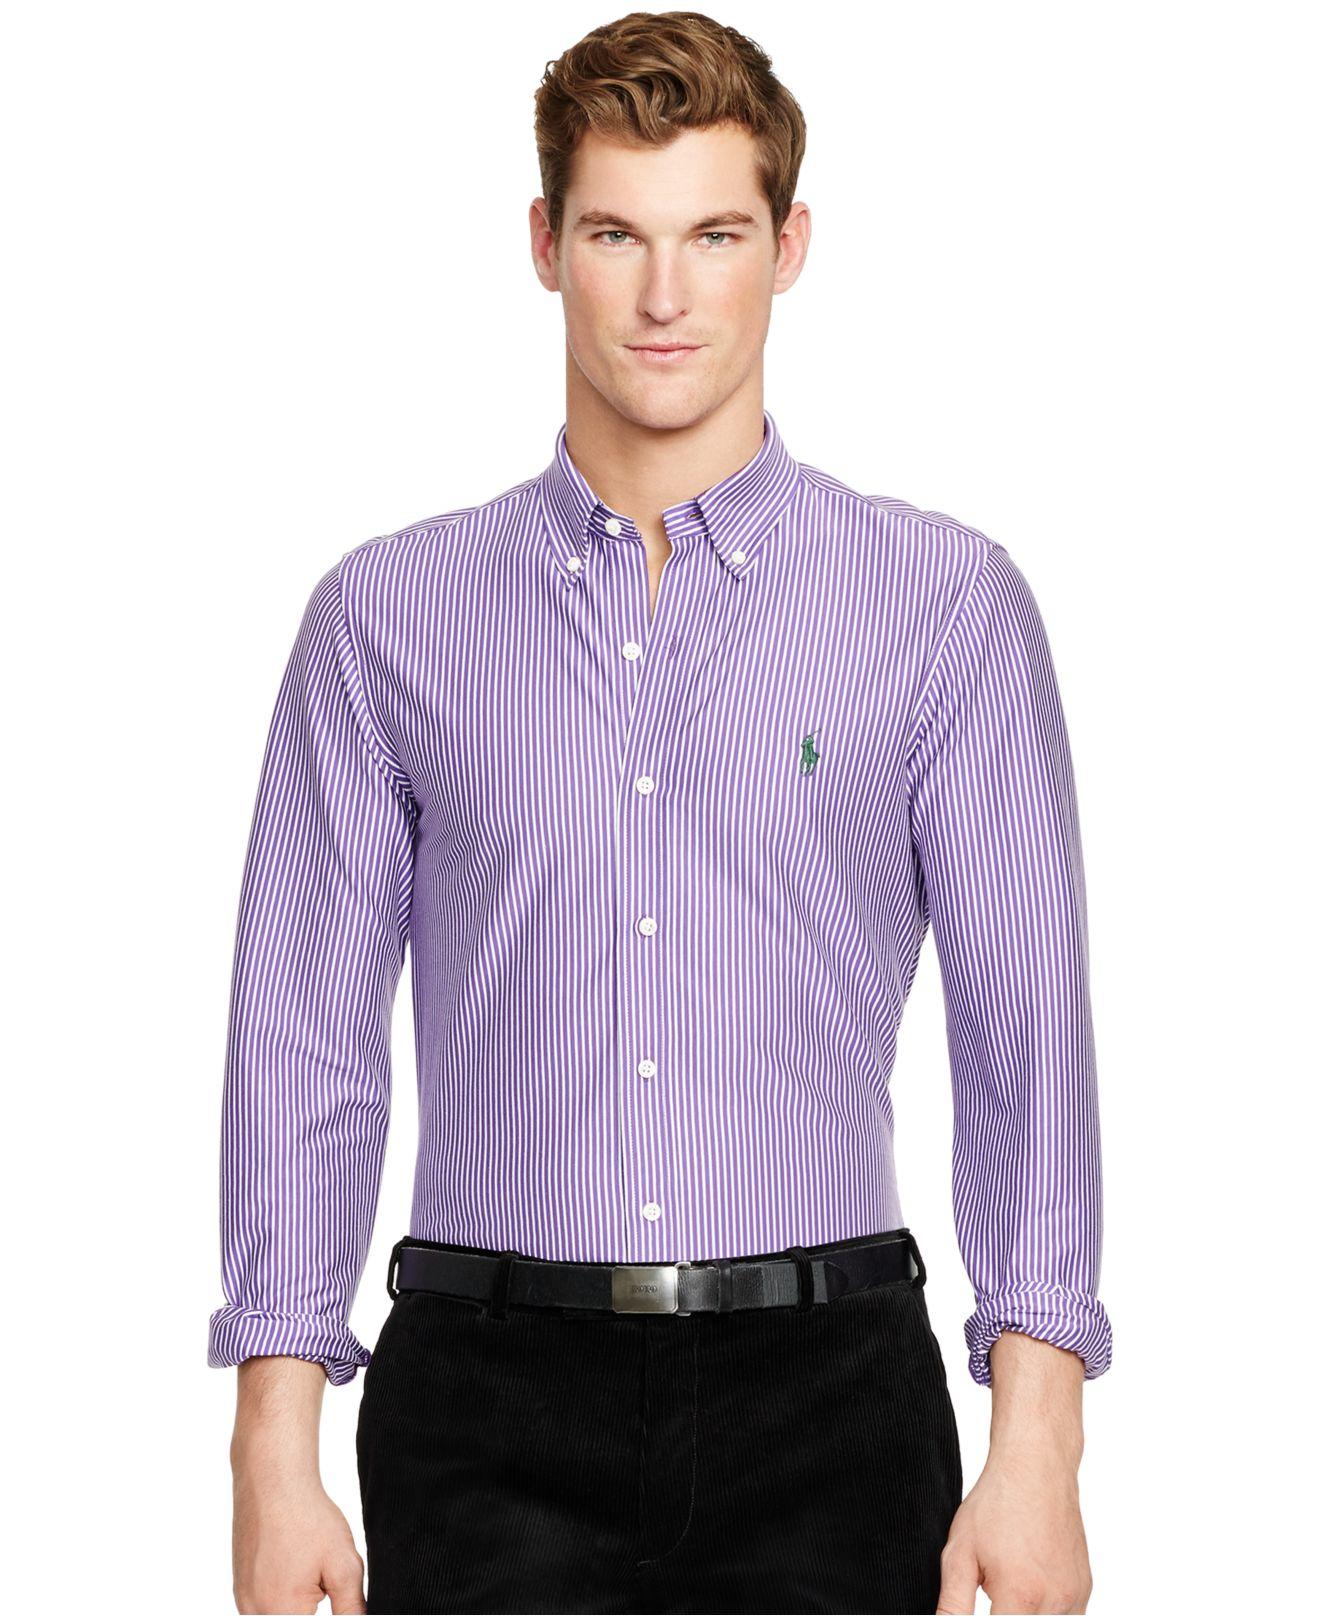 Polo ralph lauren striped knit dress shirt in purple for for Purple polo uniform shirts